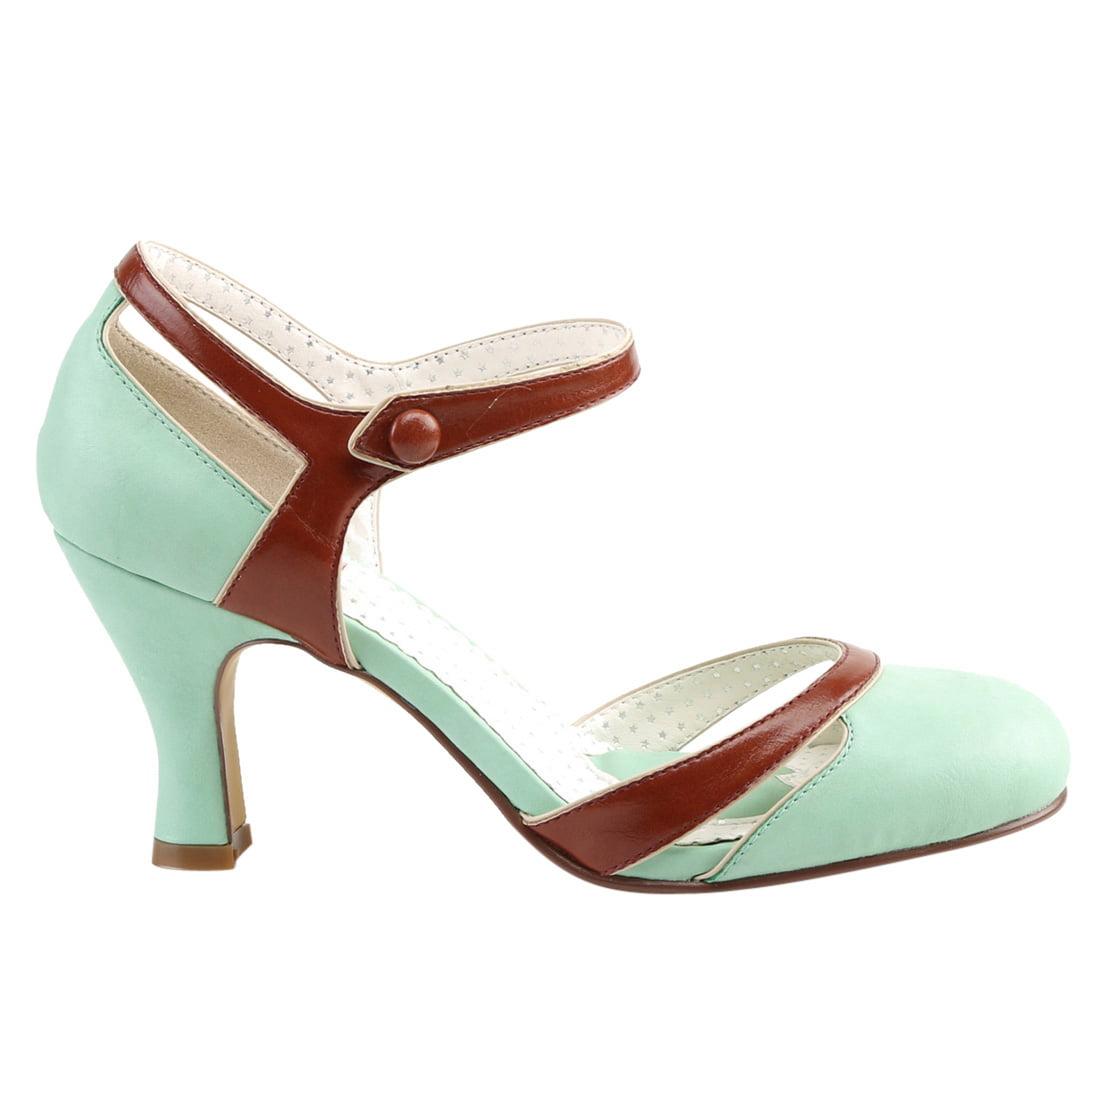 Men's/Women's:Pin Up Couture FLAPPER-27:Sales FLAPPER-27:Sales FLAPPER-27:Sales price 20ff75